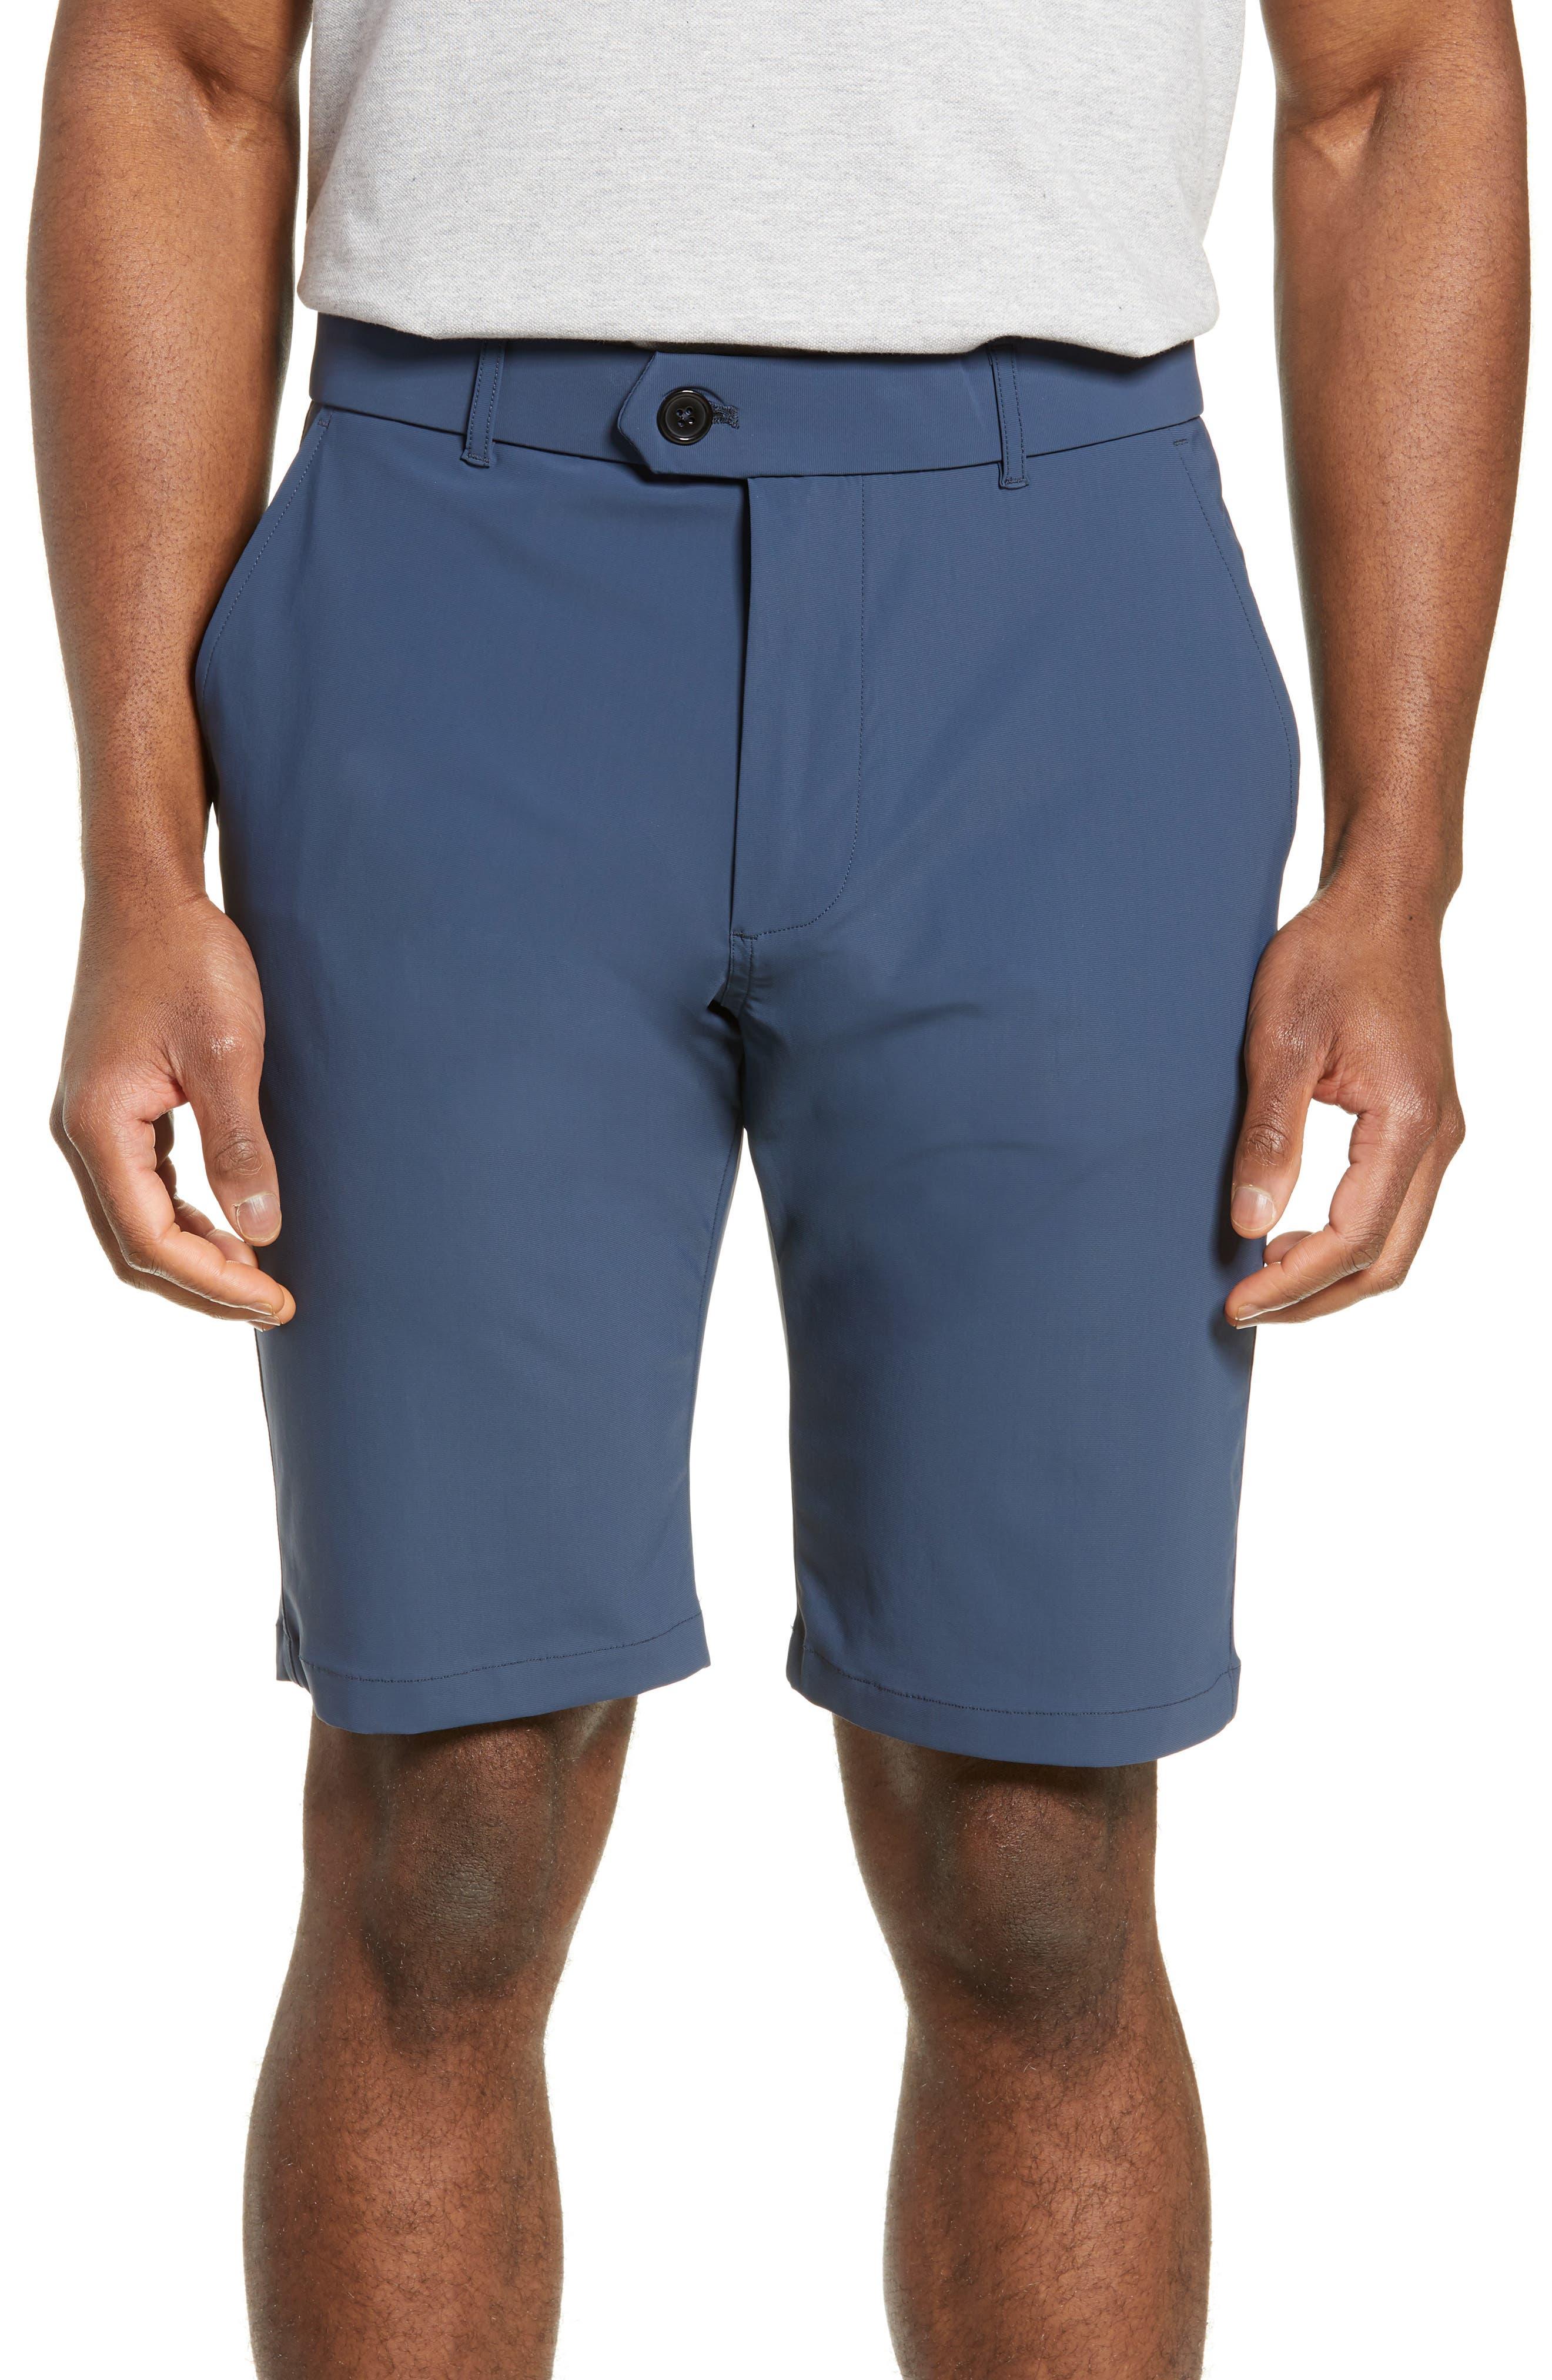 GREYSON, Montauk Technical Shorts, Main thumbnail 1, color, EEL